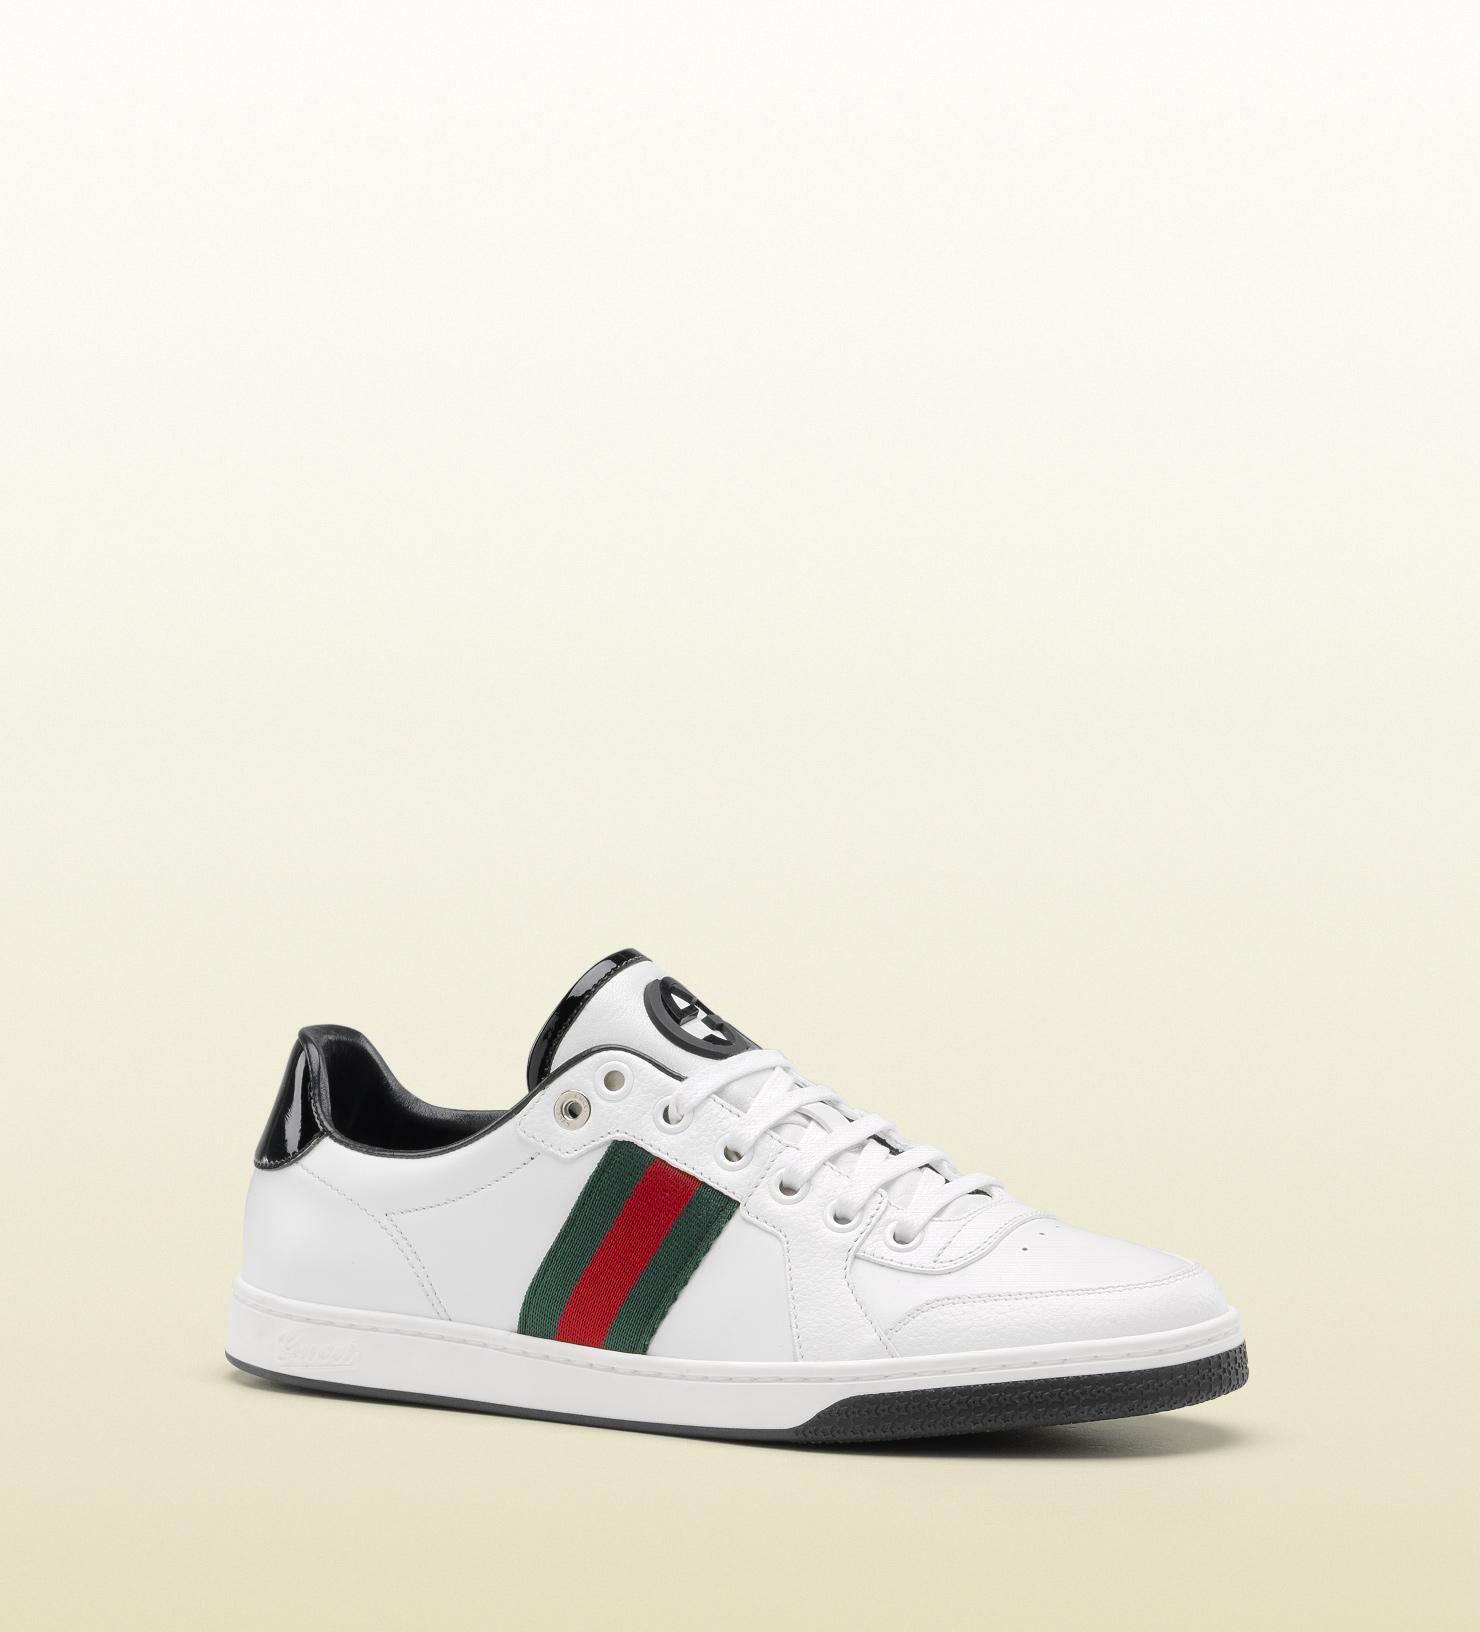 8e3ac8b4f9d Lyst - Gucci Coda Web Stripe Low Top Laceup Sneaker in White for Men